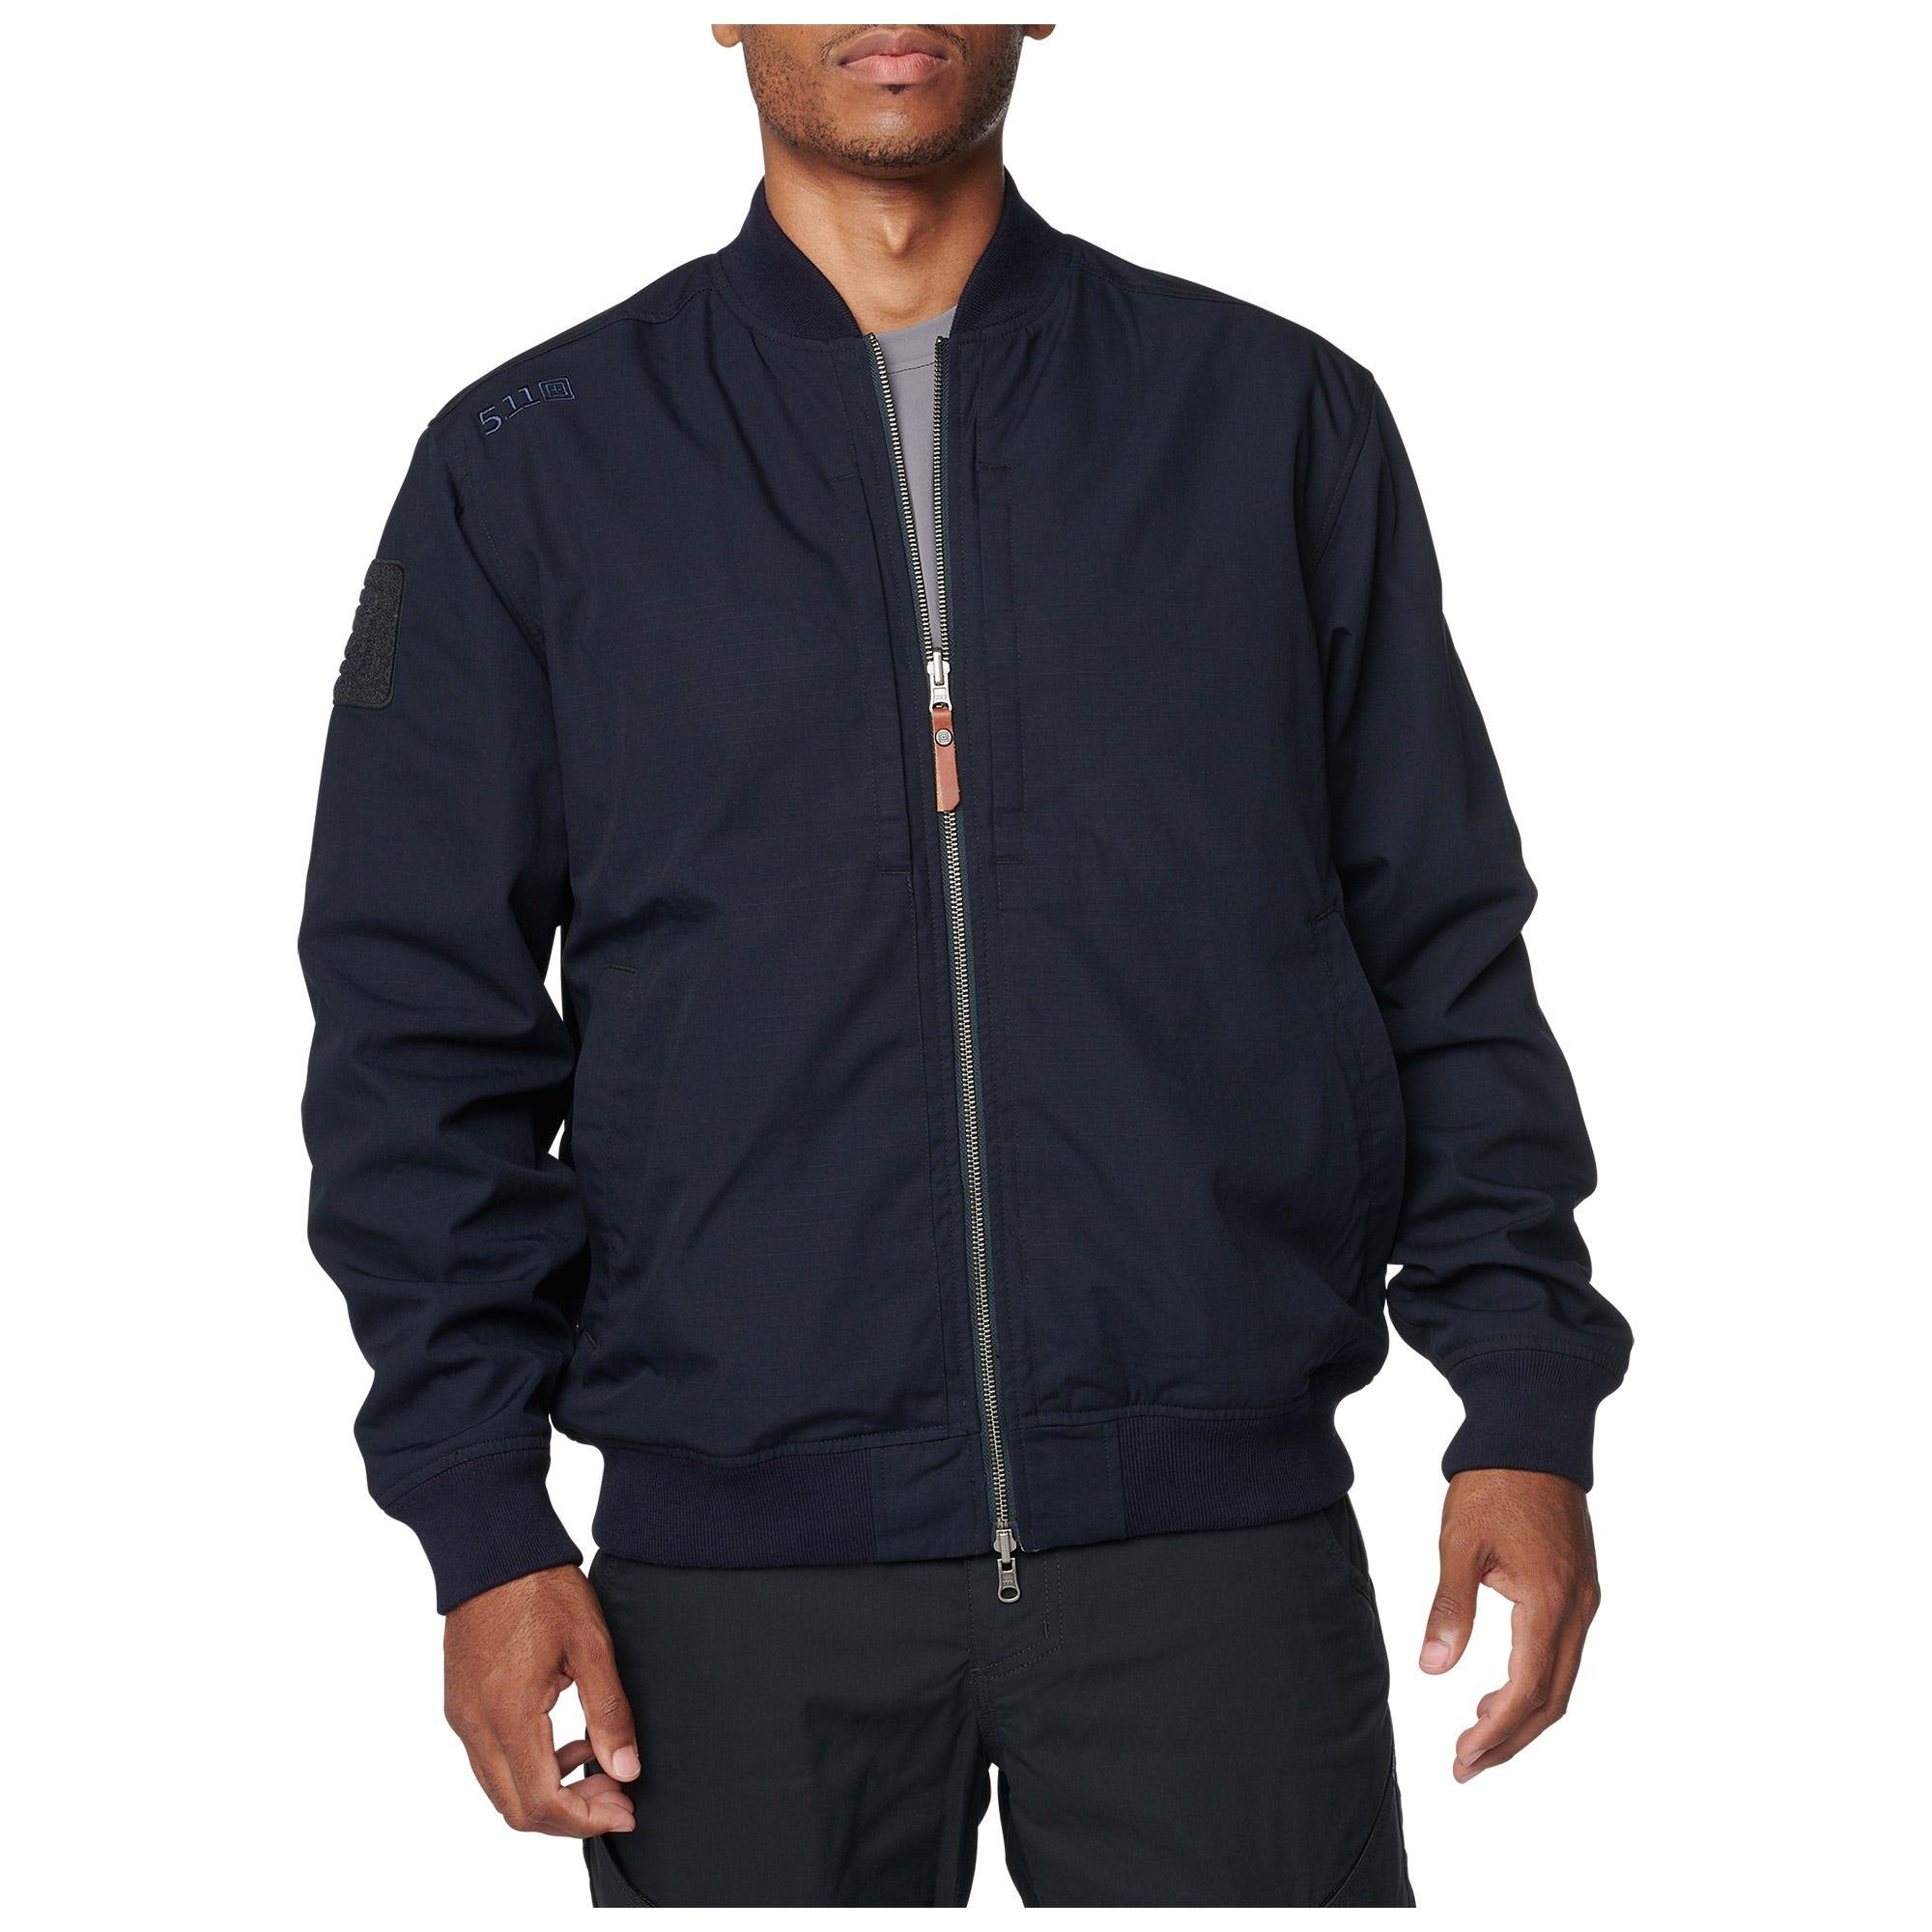 5.11 Tactical Men's Revolver Reversible Jacket (Blue)